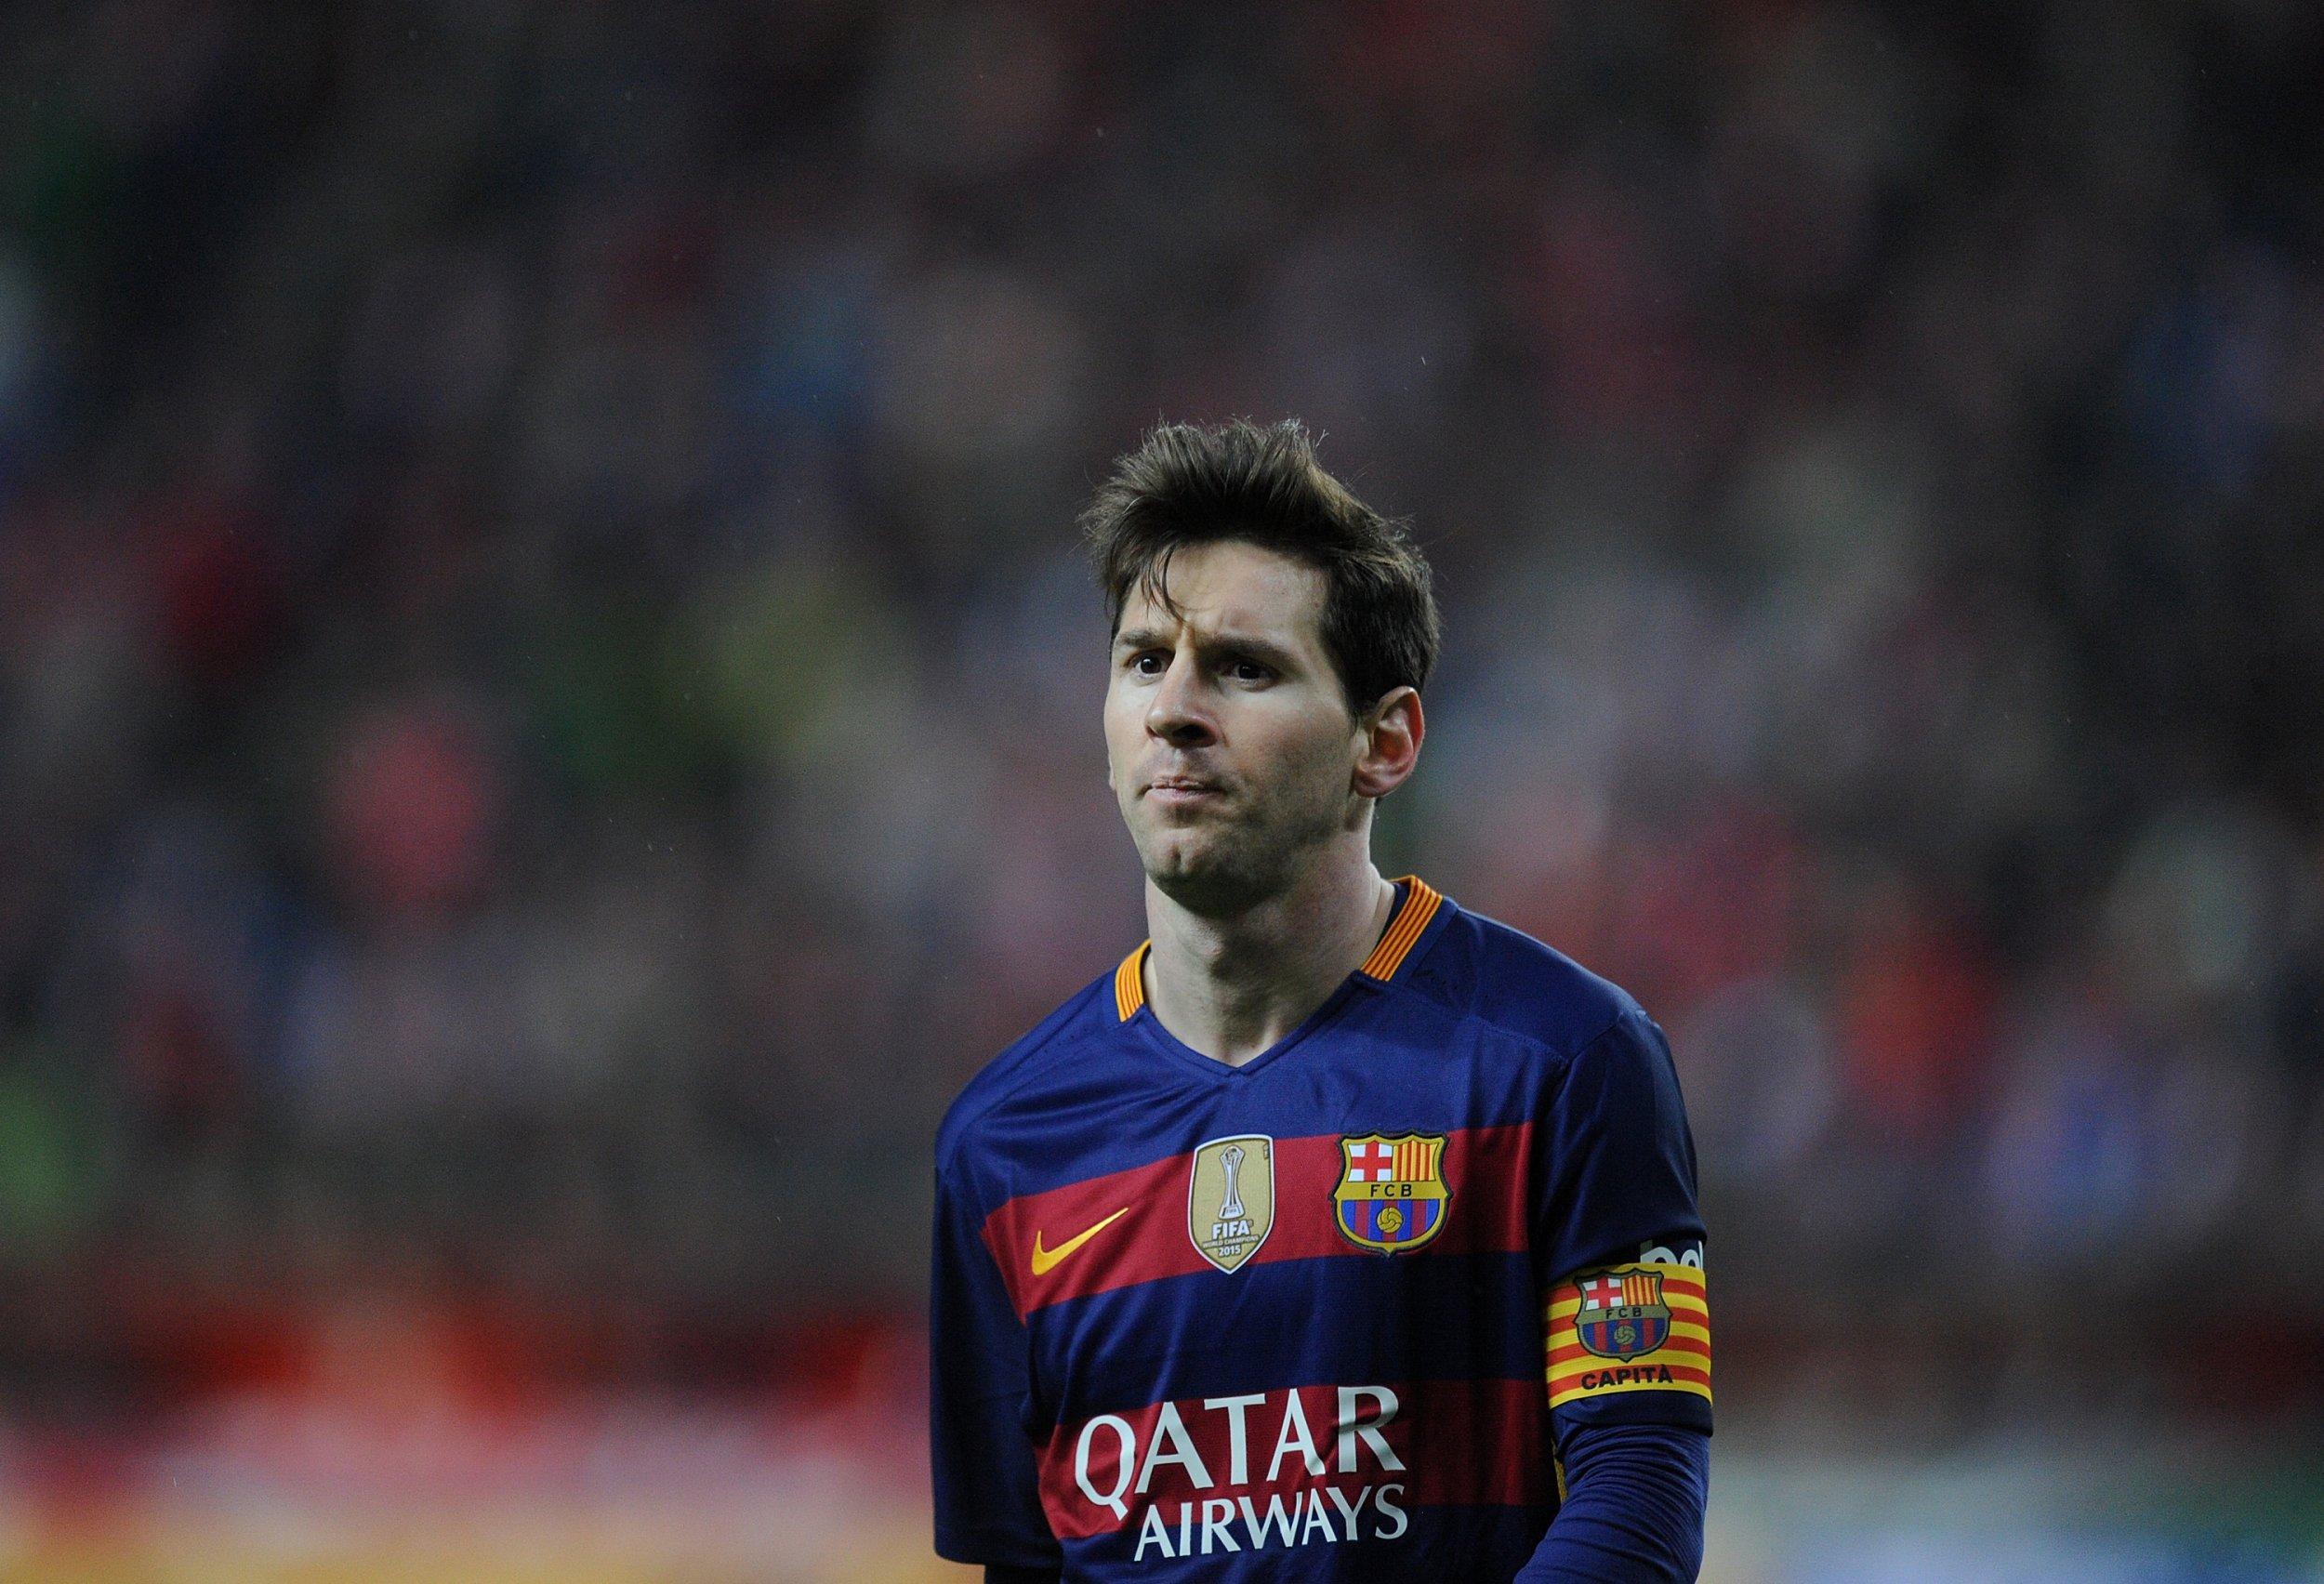 63ac5641c Barcelona's Lionel Messi is Surpassing Pele, Diego Maradona and ...